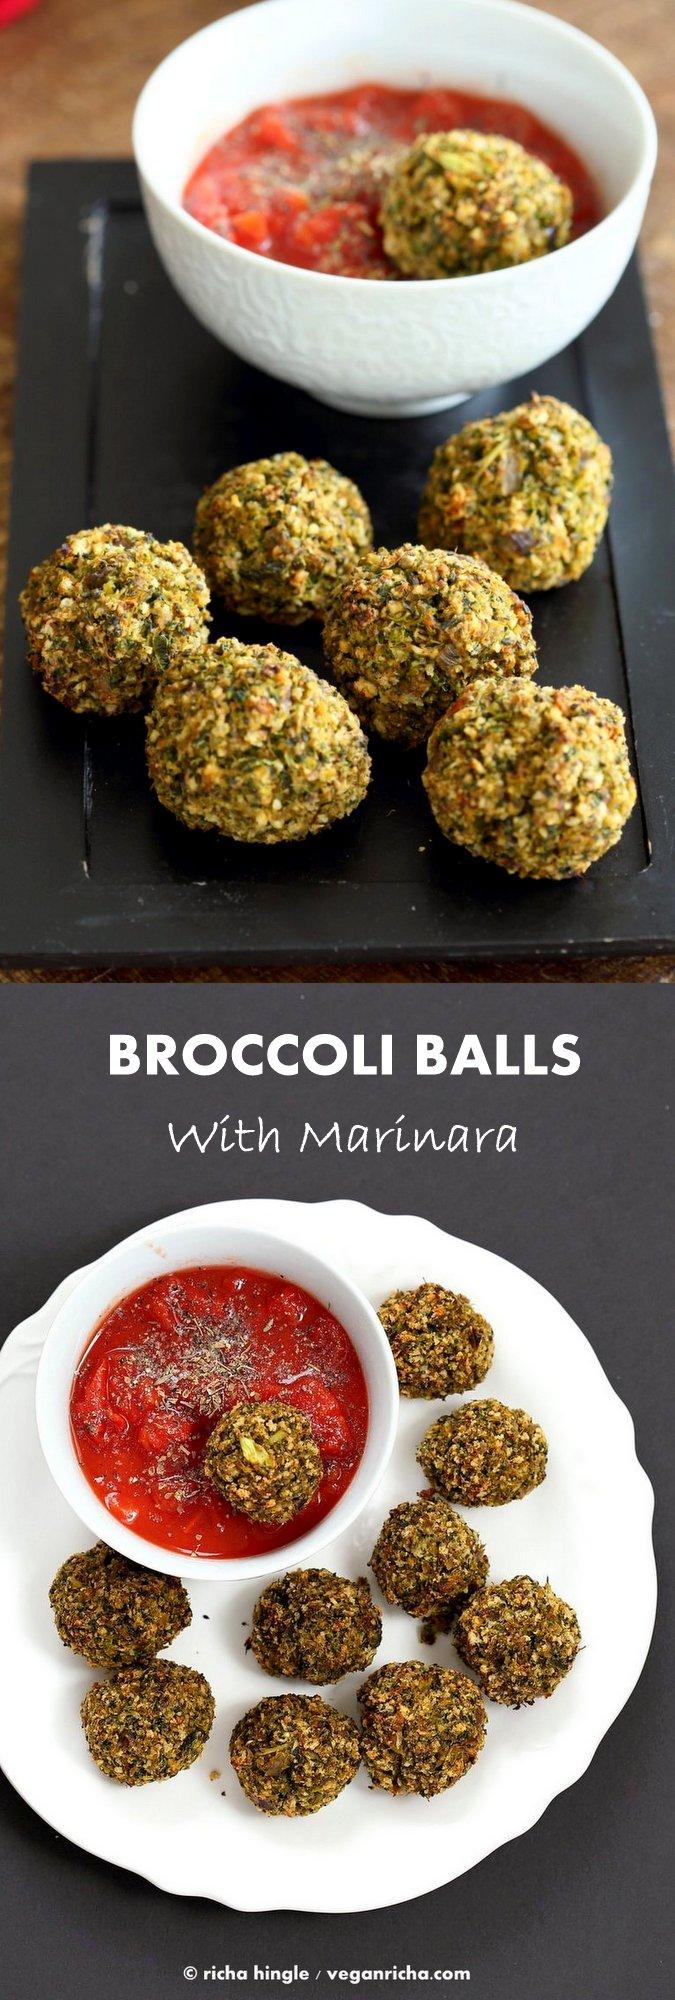 Vegan Broccoli Balls. Broccoli Cheese Balls, veggie / meat balls. Serve with marinara, or over spaghetti or in a sub.| VeganRicha.com vegan recipe